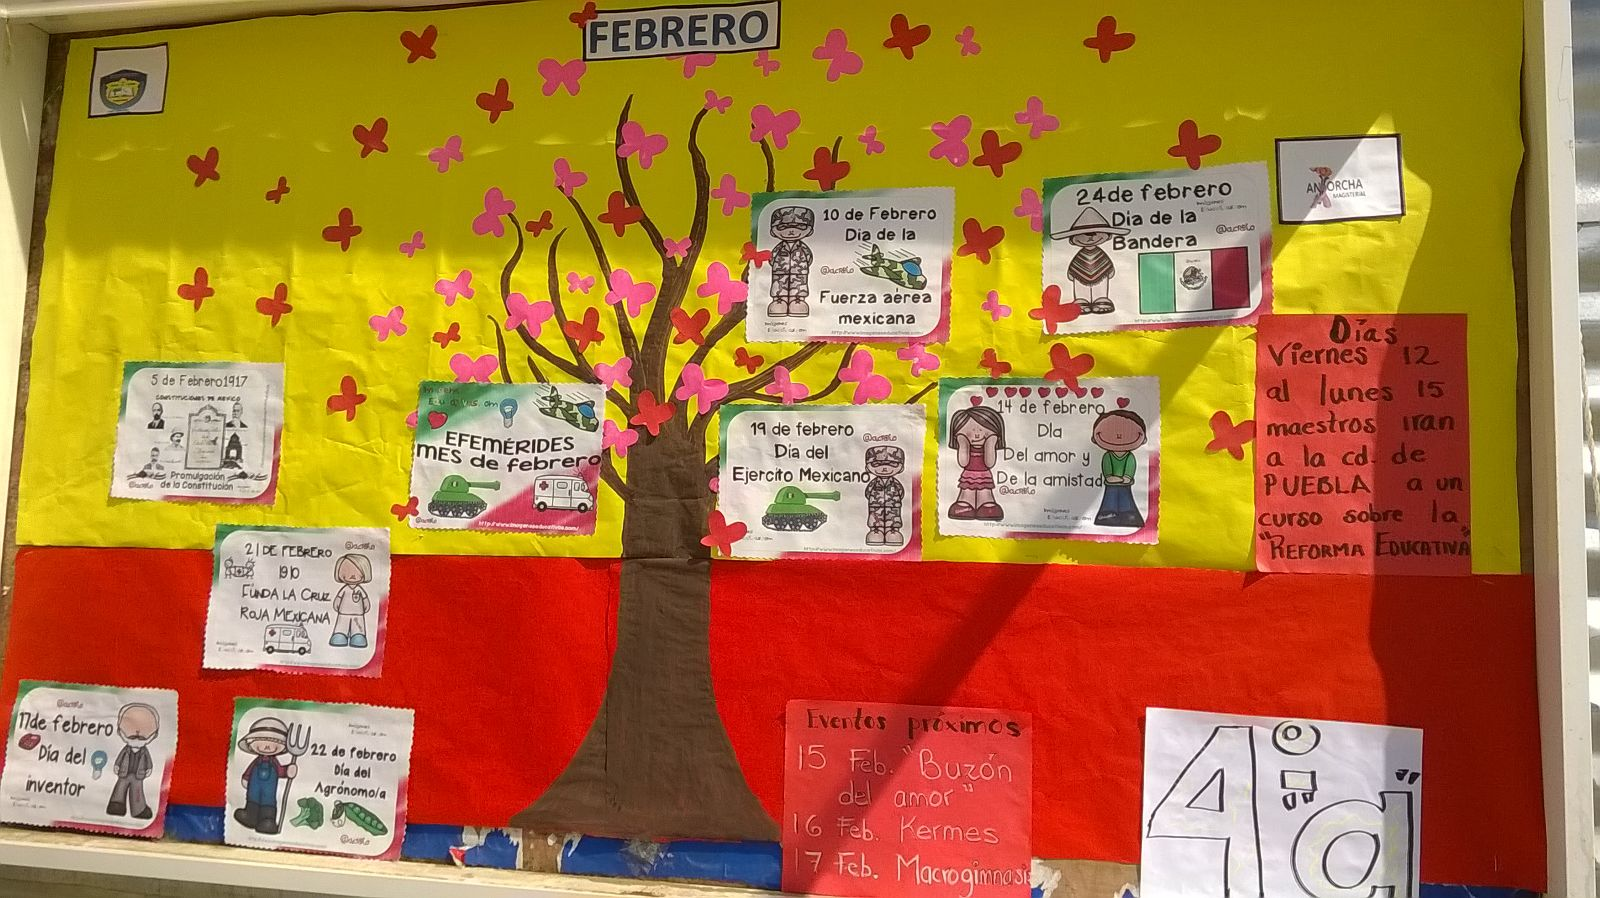 Seccional sur peri dico mural mes se febrero for Como organizar un periodico mural